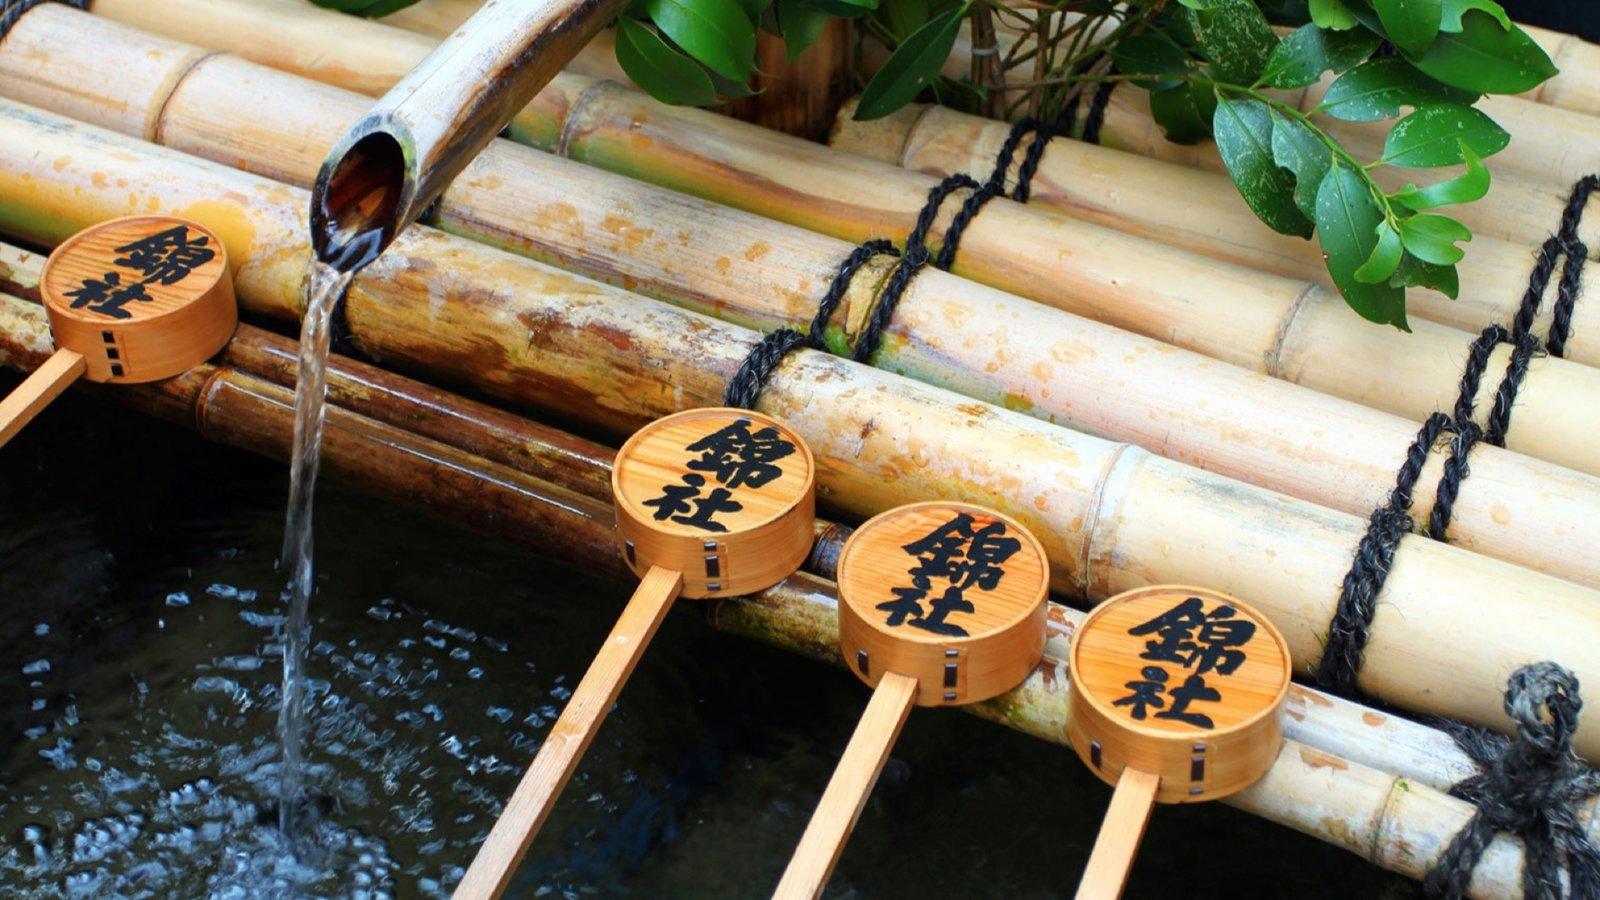 Related Traditions - Shinto and Tenrikyo